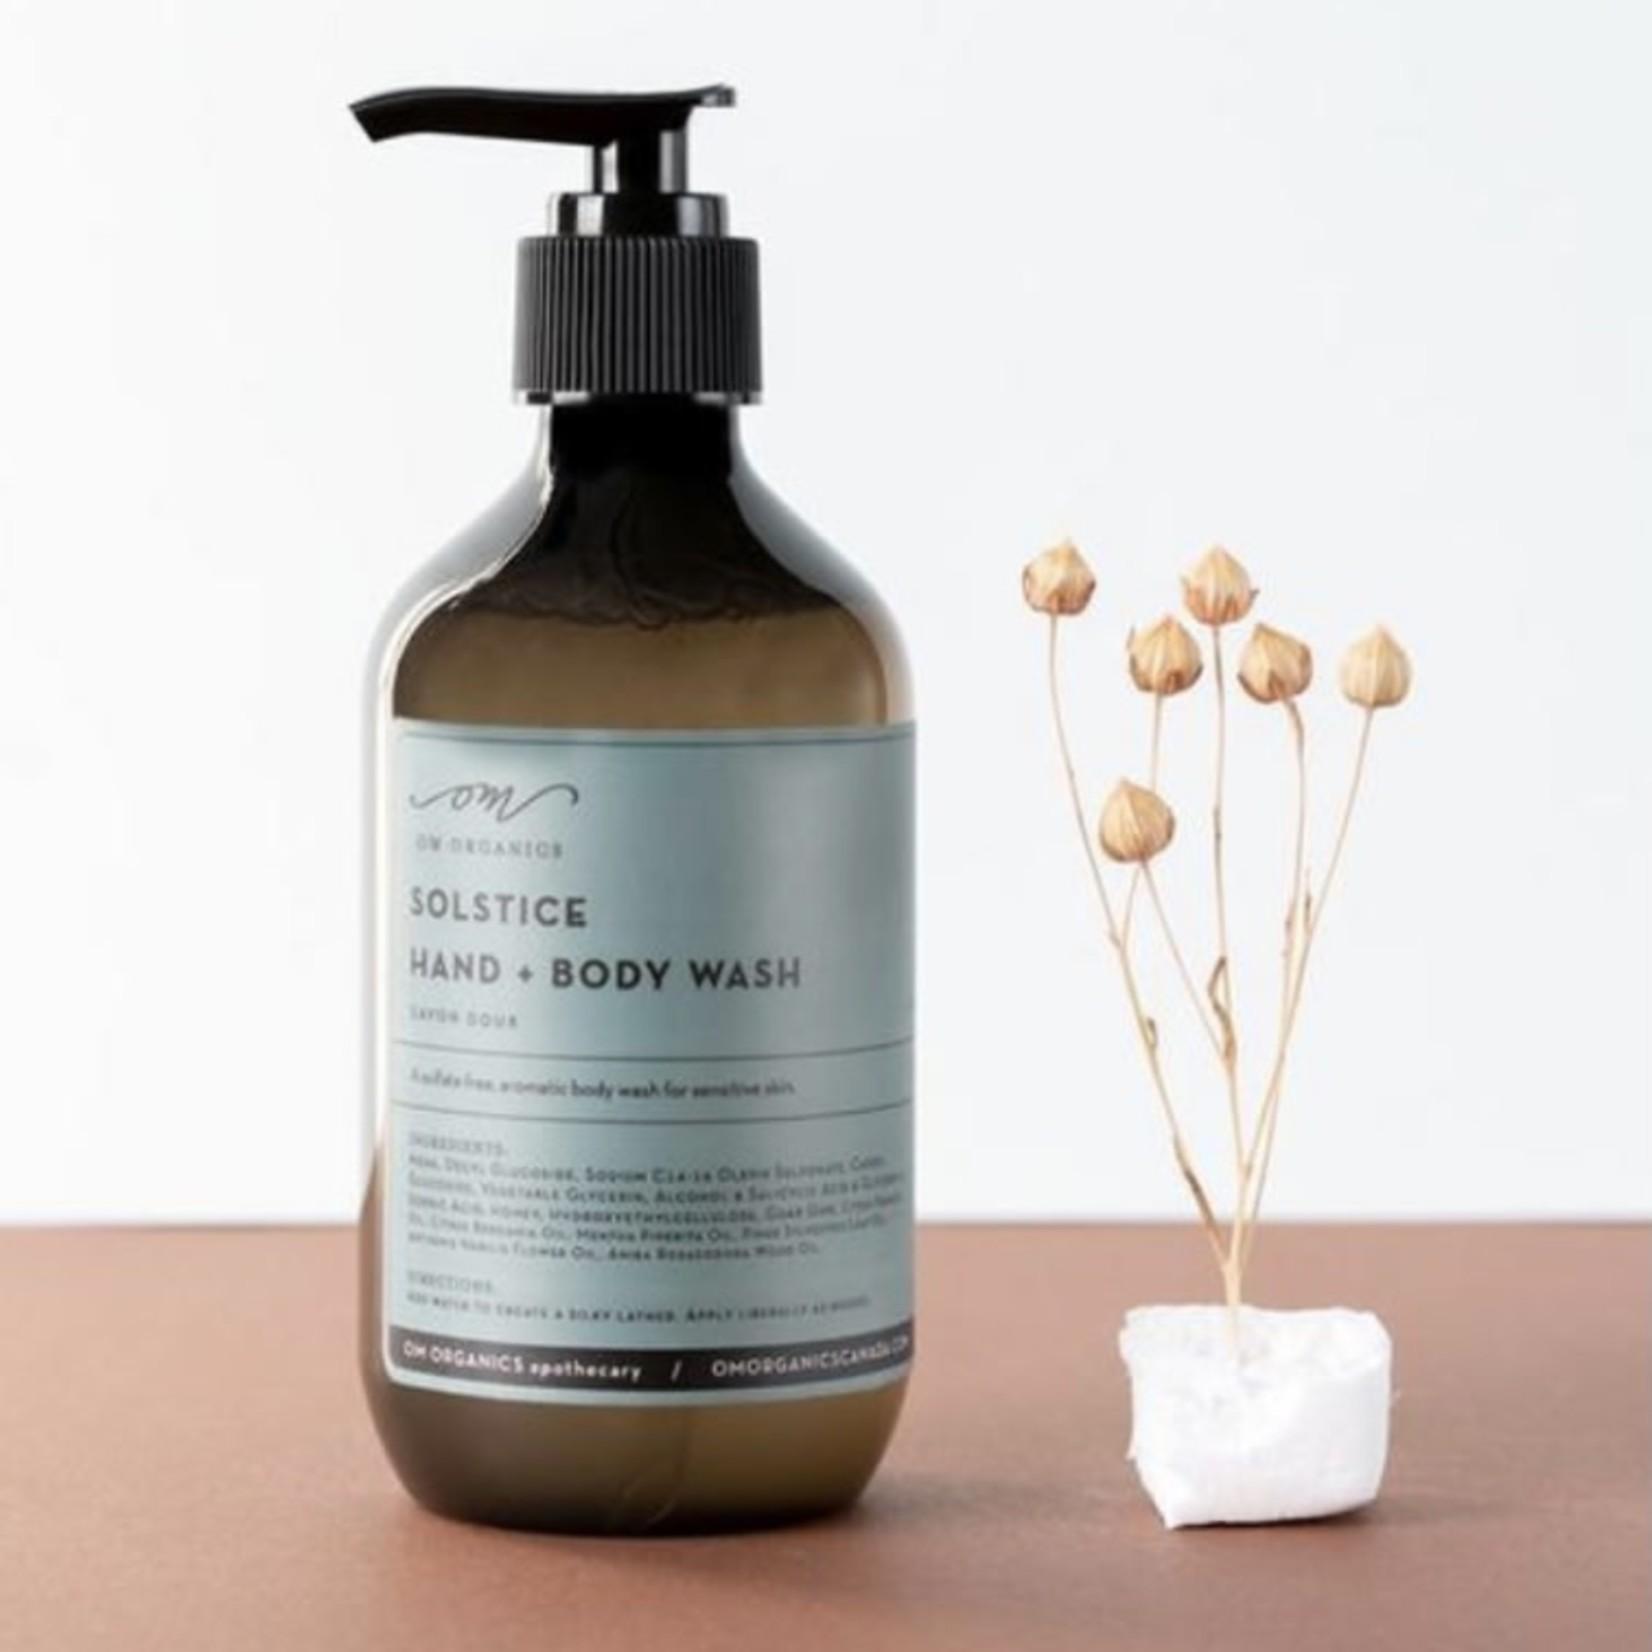 om organics solstice hand & body wash